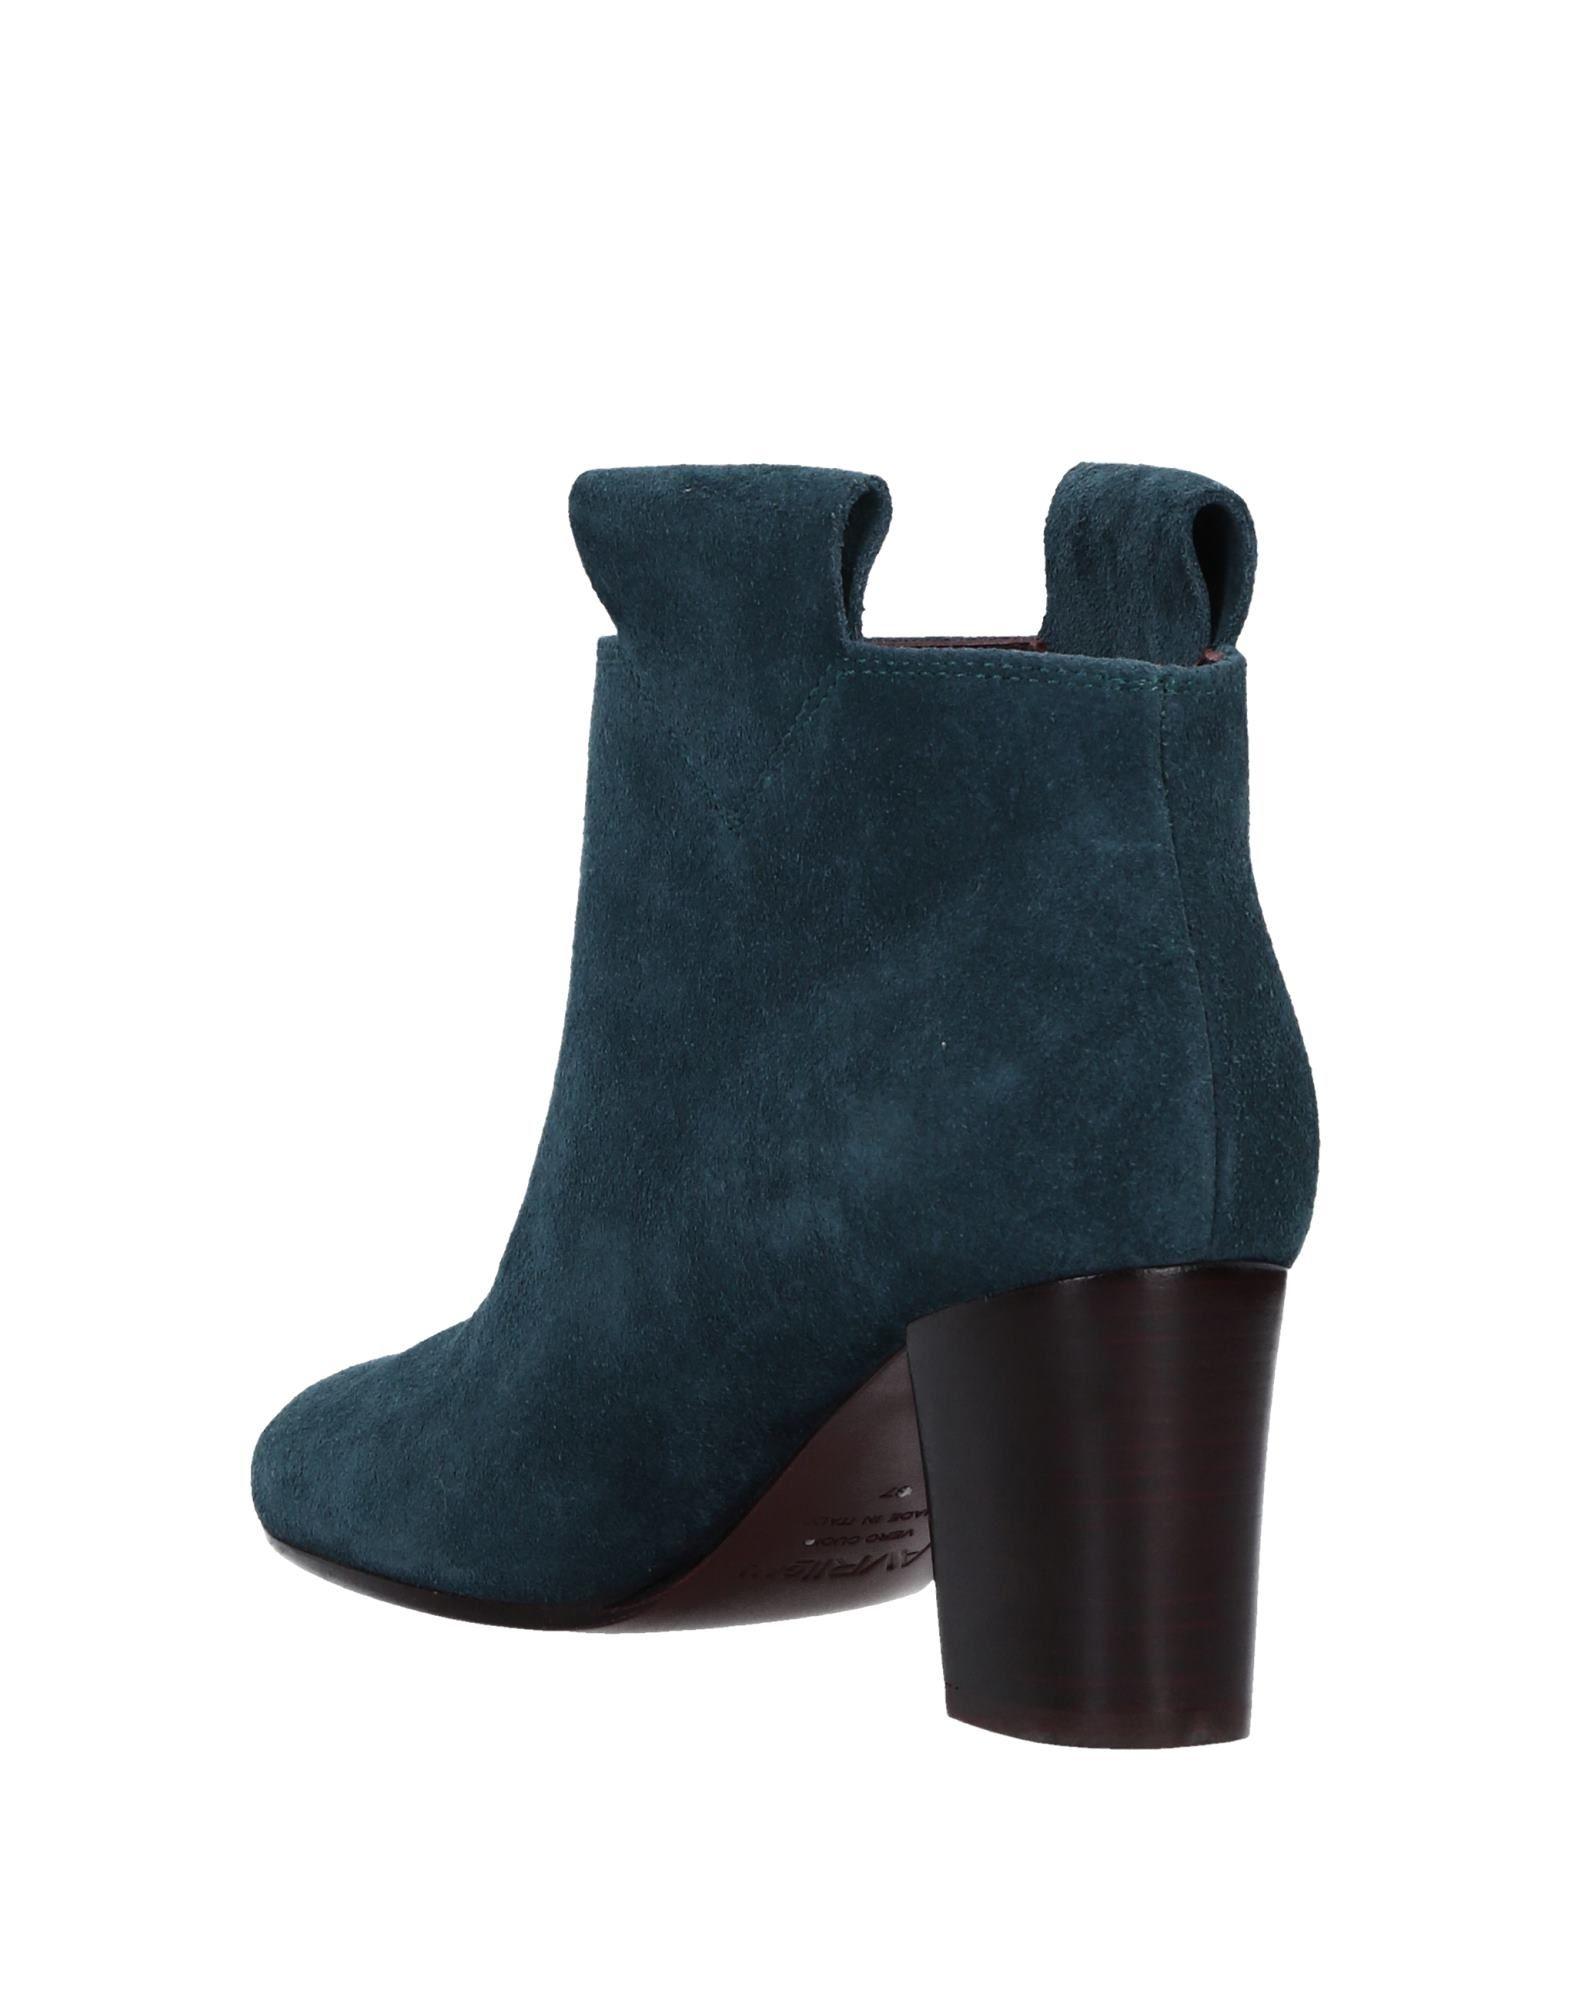 Avril 11539483SKGut Gau Stiefelette Damen  11539483SKGut Avril aussehende strapazierfähige Schuhe f69cd5